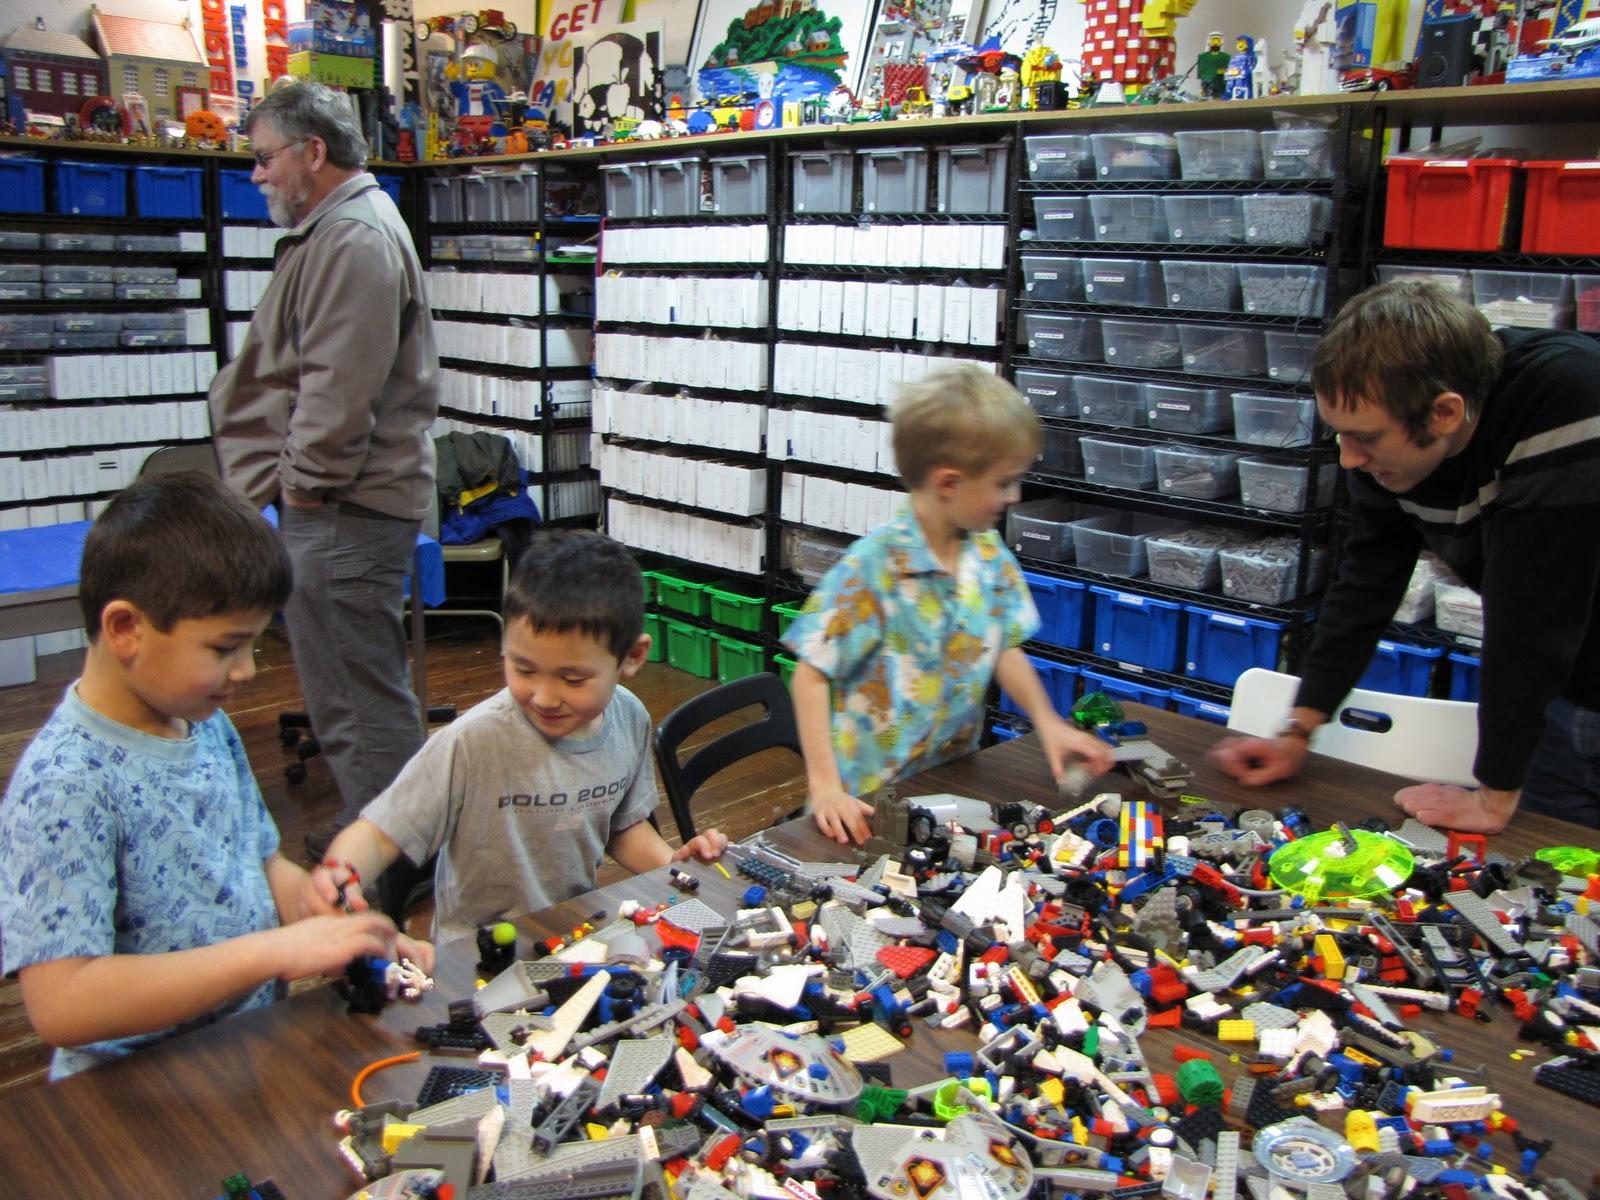 Sleepless in Babyland AWESOME LEGO PARTY -> Tuto Table Lego